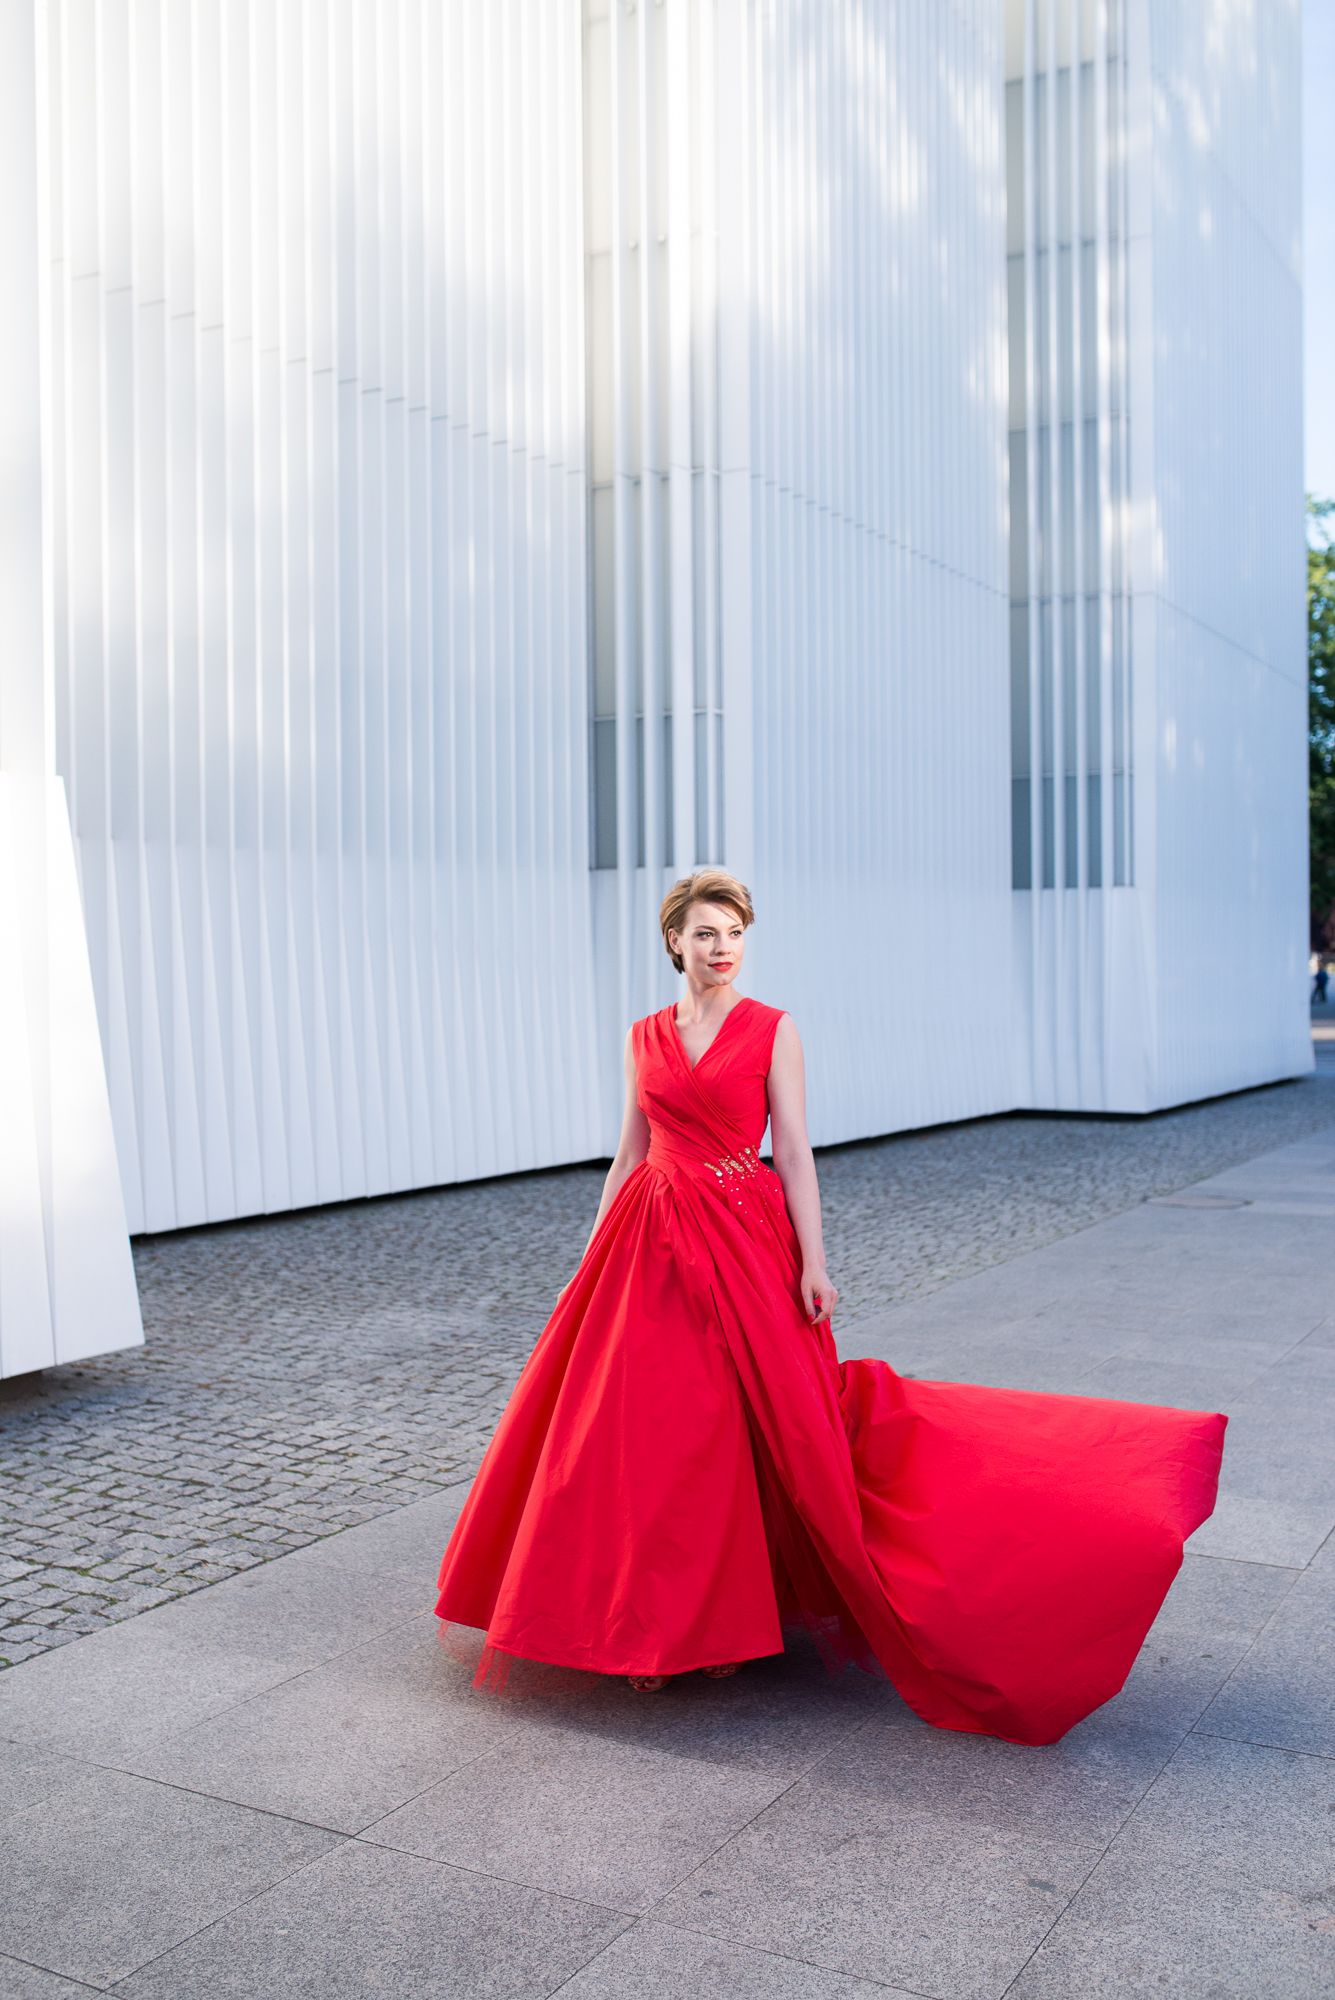 Essie gel couture trifft sisterMAG fashion in Stettin//Essie gel couture meets sisterMAG in Stettin//Foto: Chris Santos //Model: Franziska Schnelle // Fashion: @Evi N. // Nailart: @essiede  // Styling: Karina Berg // Behind the scenes: Loris Rizzo